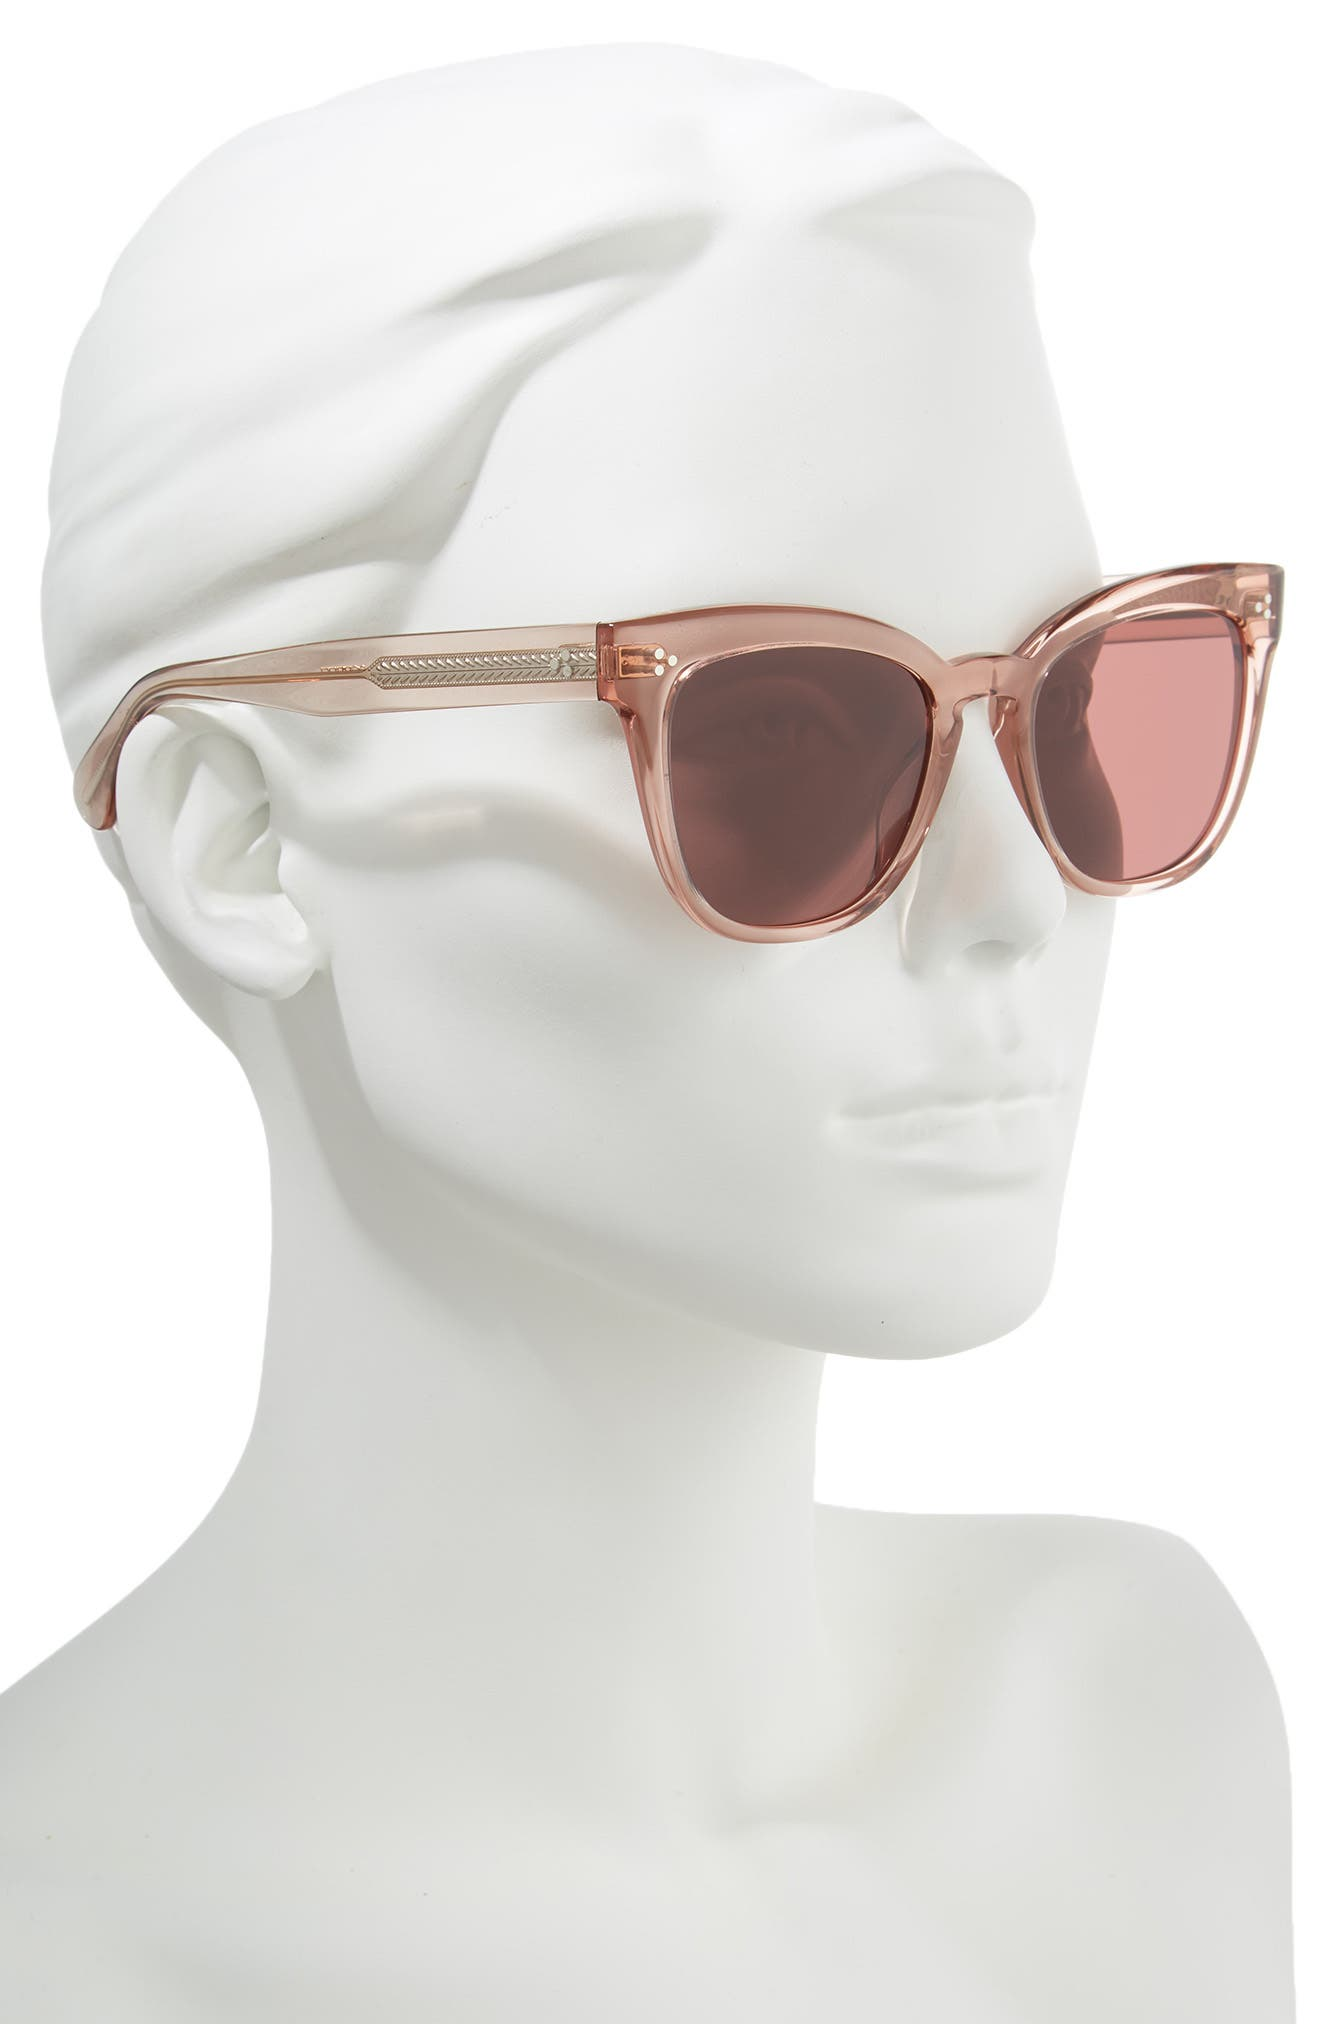 OLIVER PEOPLES,                             Marianela 54mm Cat Eye Sunglasses,                             Alternate thumbnail 2, color,                             WASHED ROSE